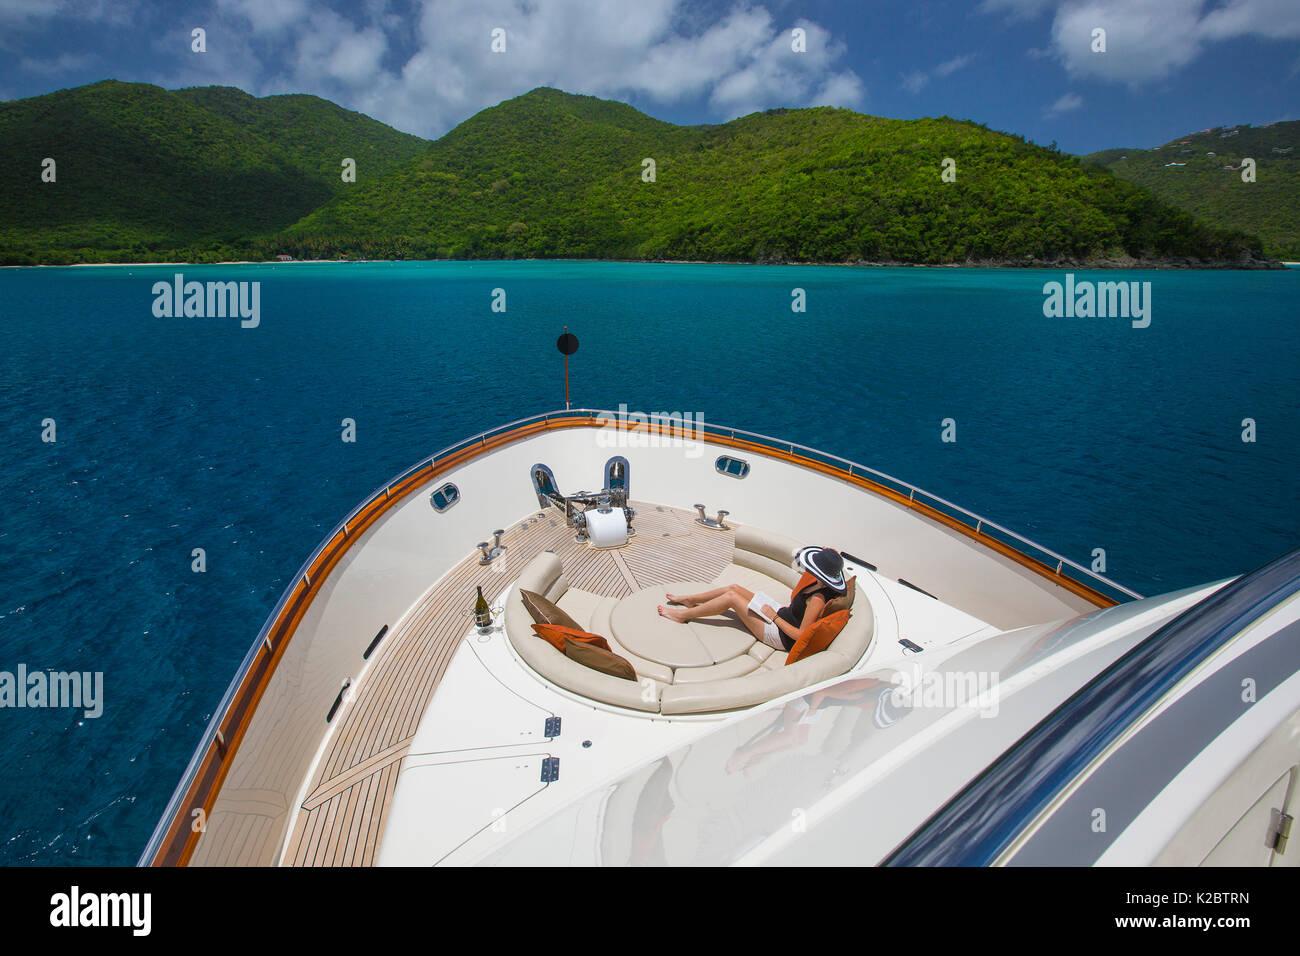 Watershed, 87-foot President Yacht, Saint John, U.S. Virgin Islands, May 2012. - Stock Image